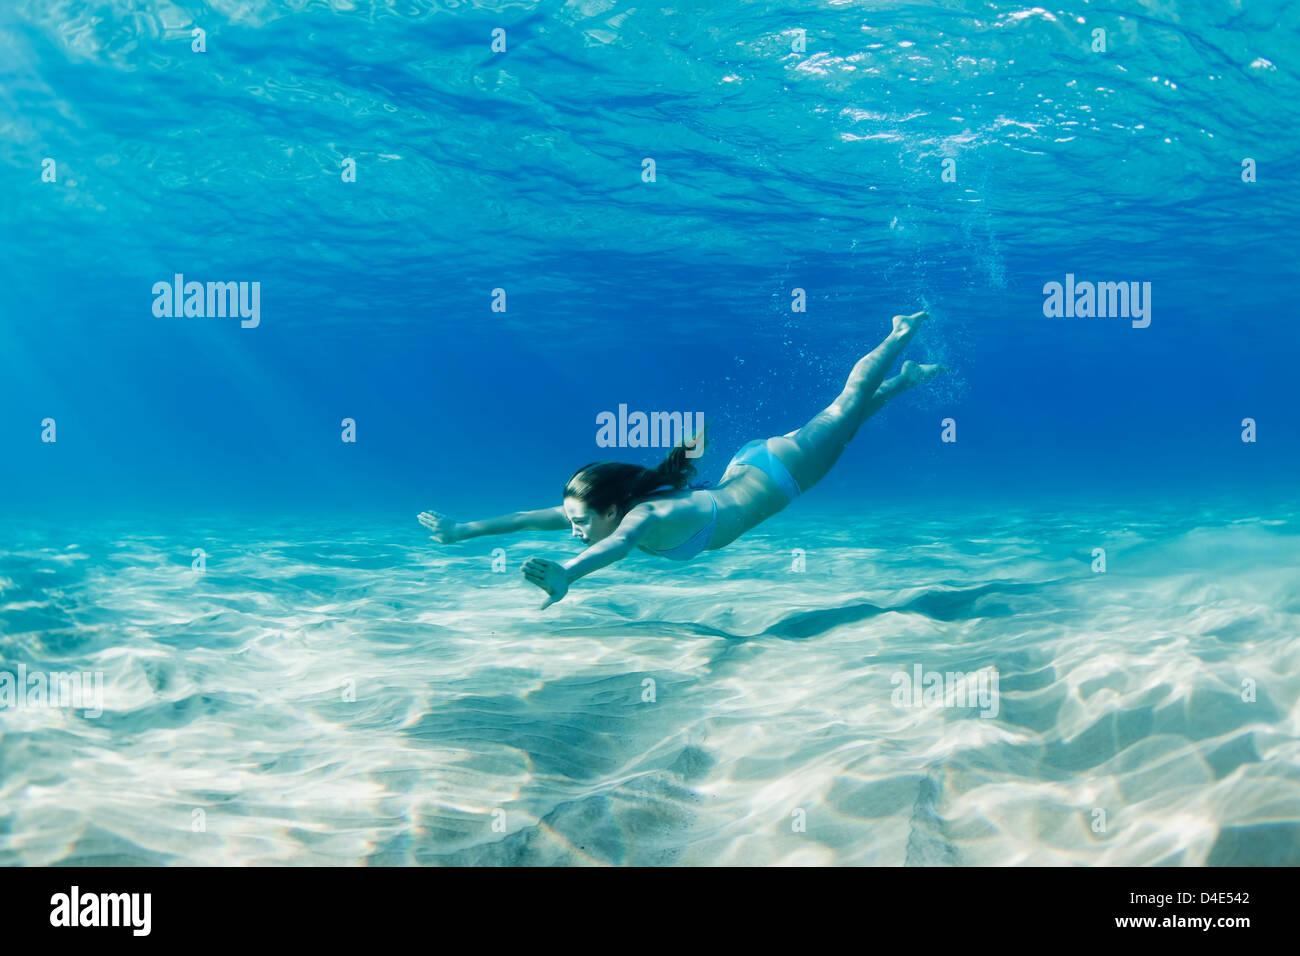 Images Of The Ocean Floor Wallpaper Images